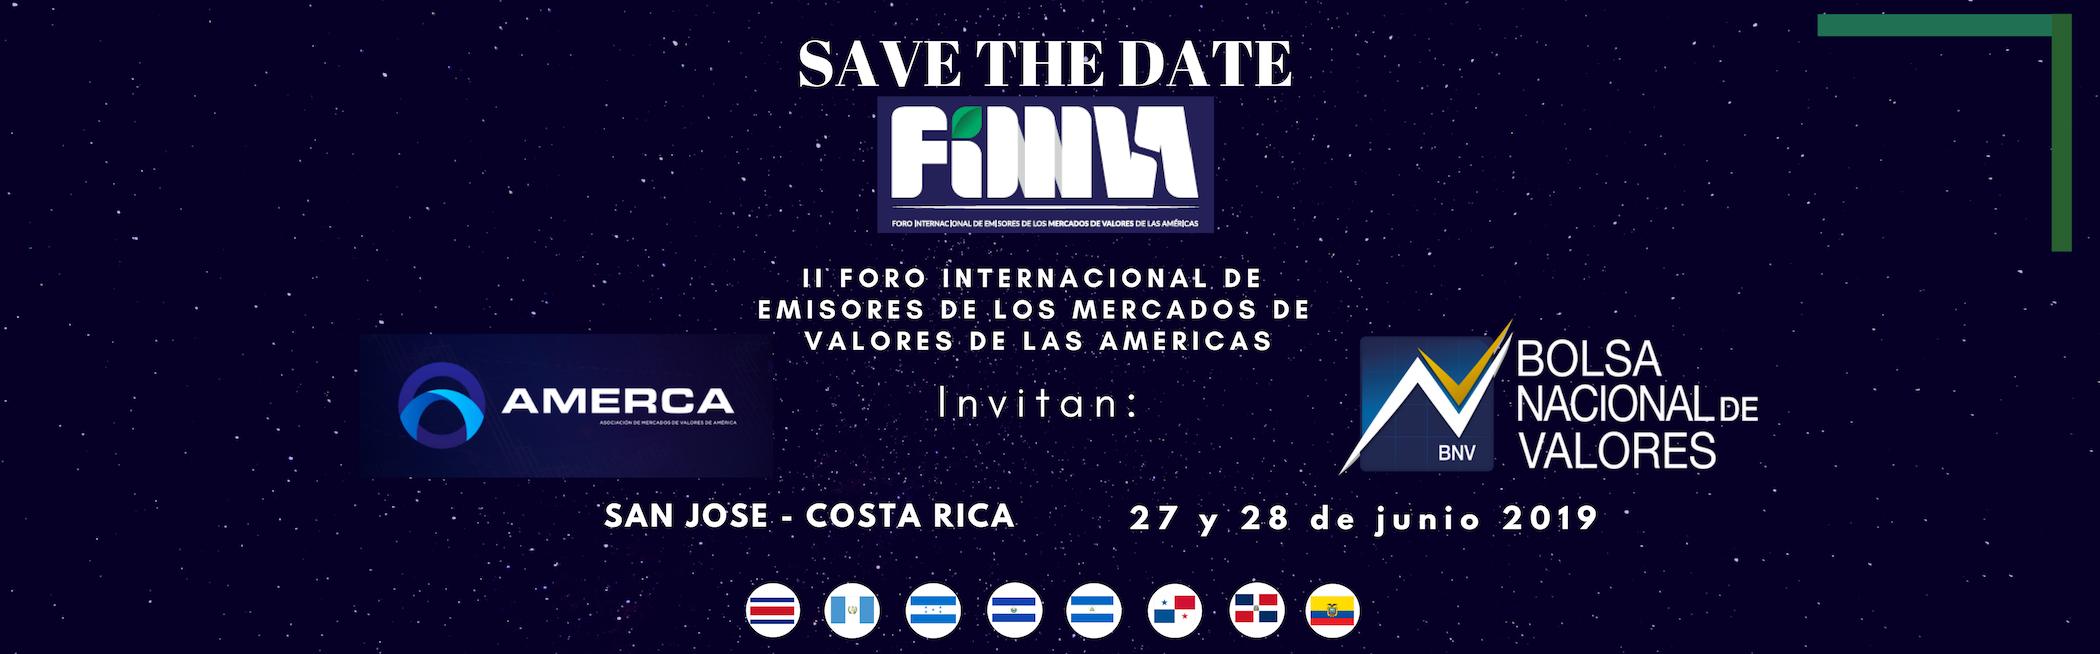 Copia de SAVE THE DATE COSTA RICA